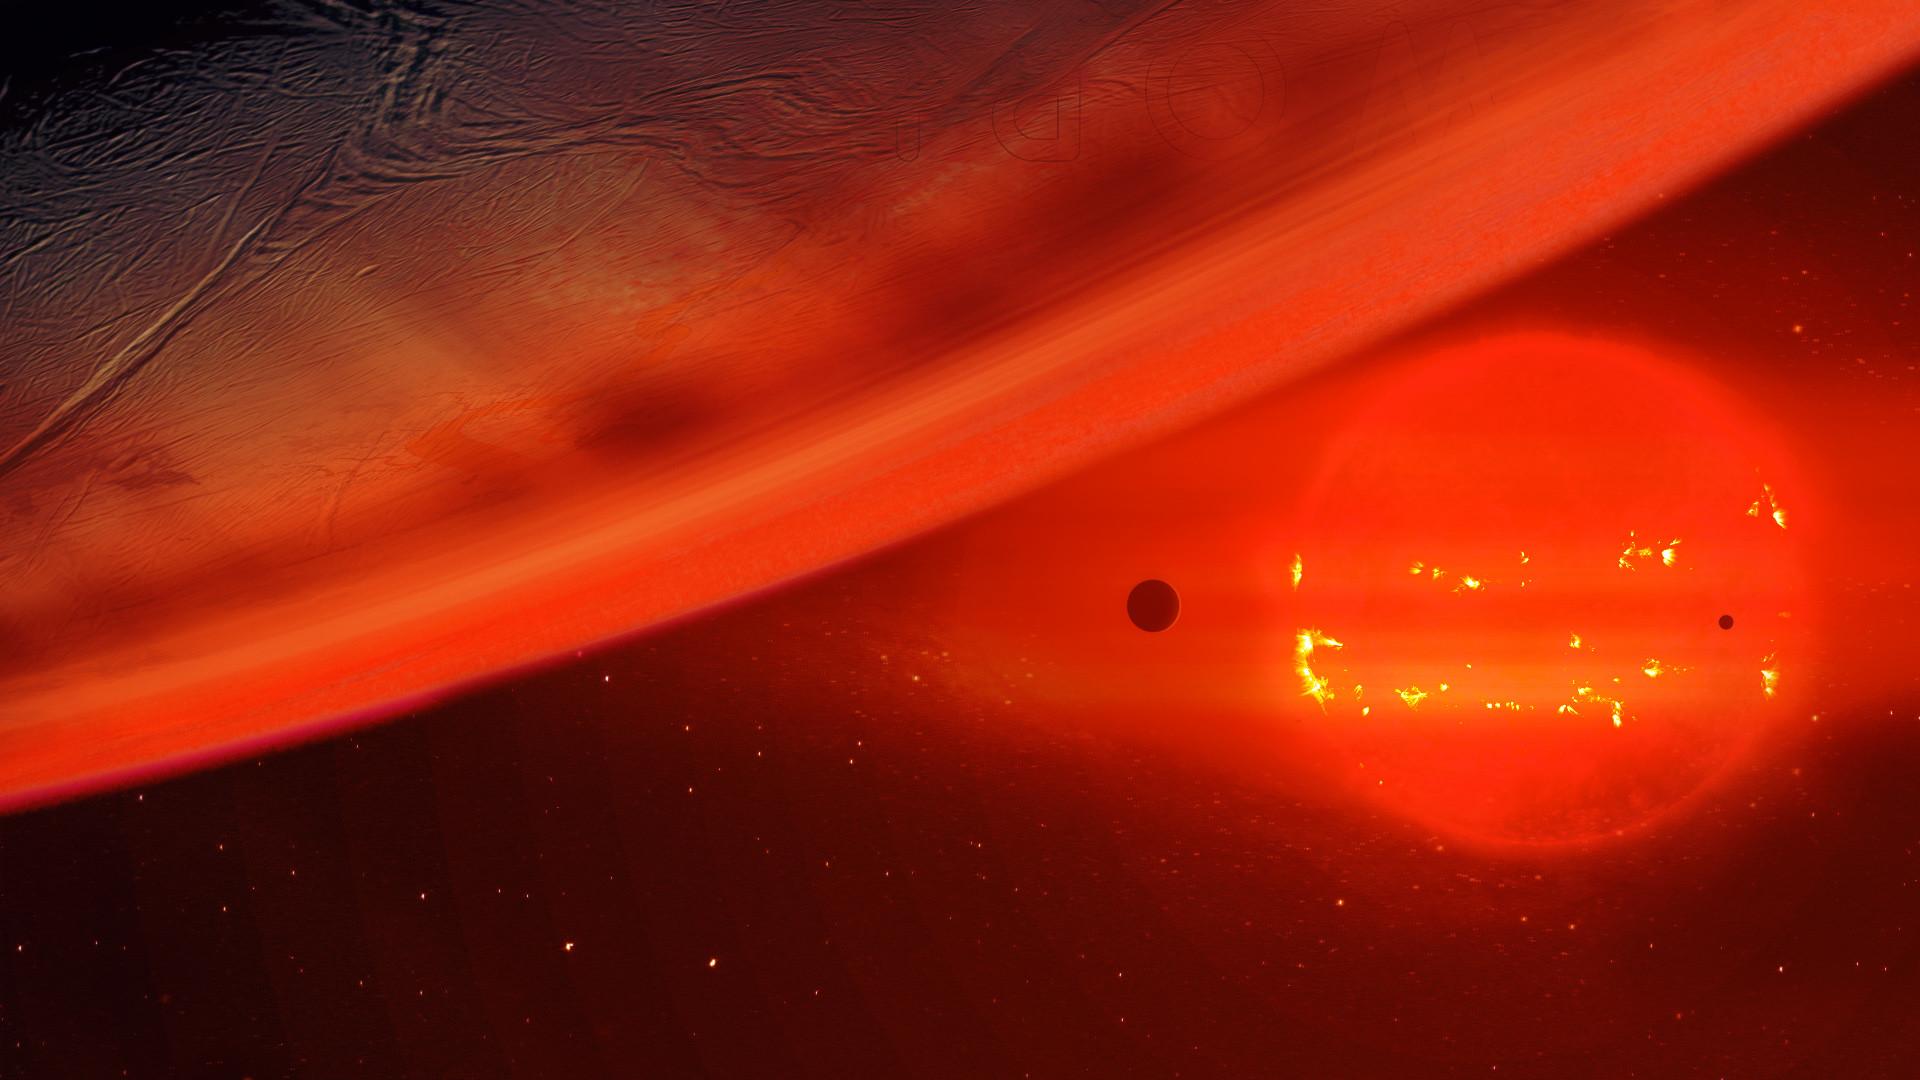 Звёздное небо и космос в картинках - Страница 6 Jakub-grygier-017-tidaly-locked-worlds-aa